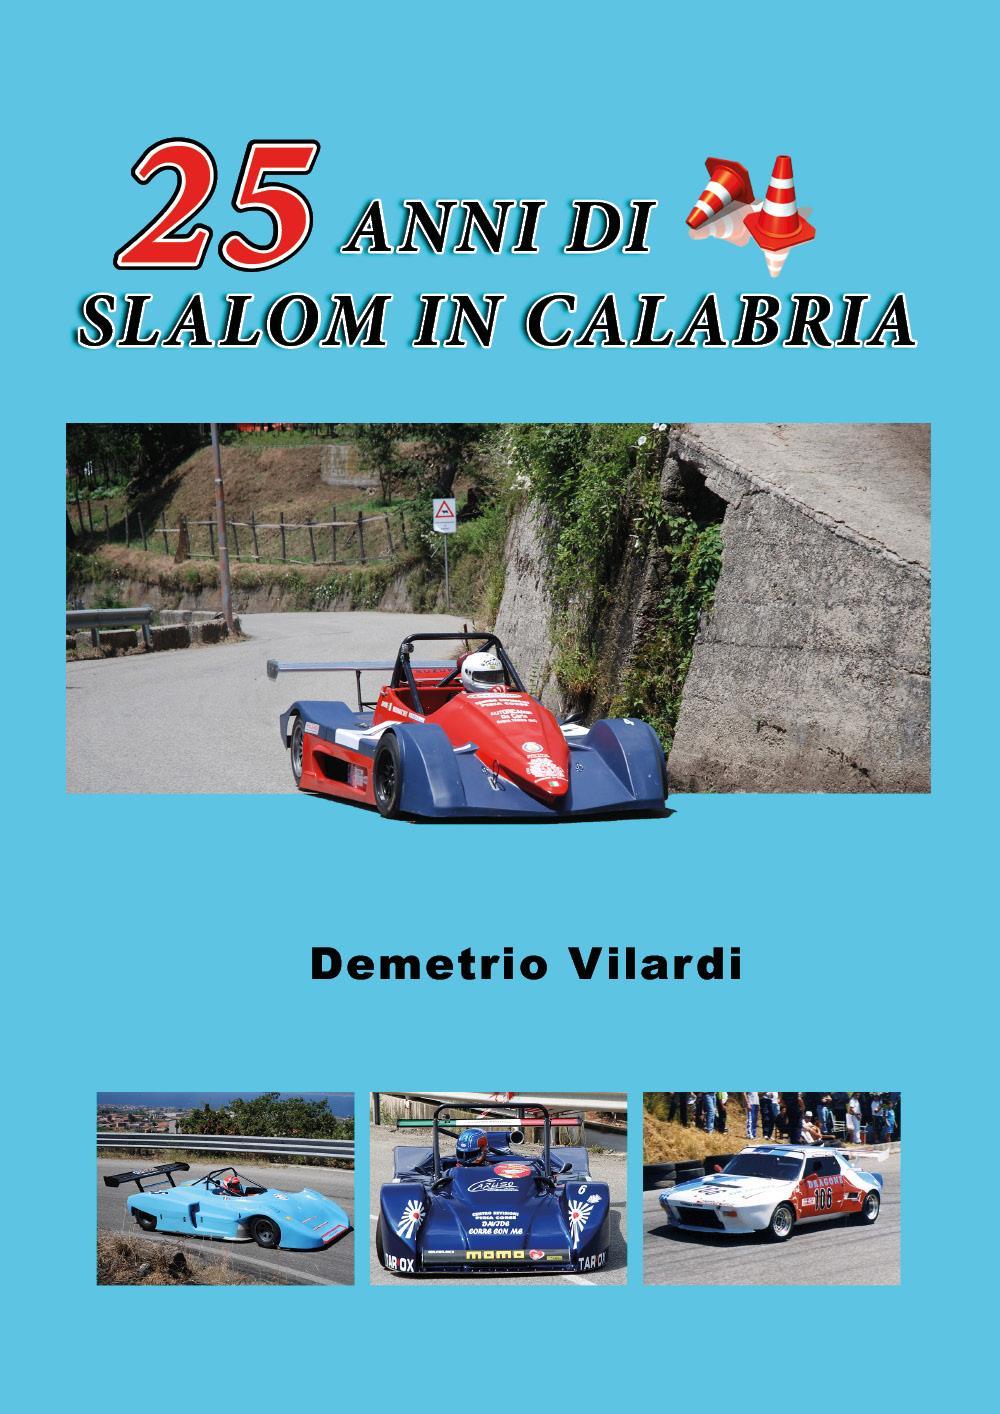 25 anni di slalom in Calabria